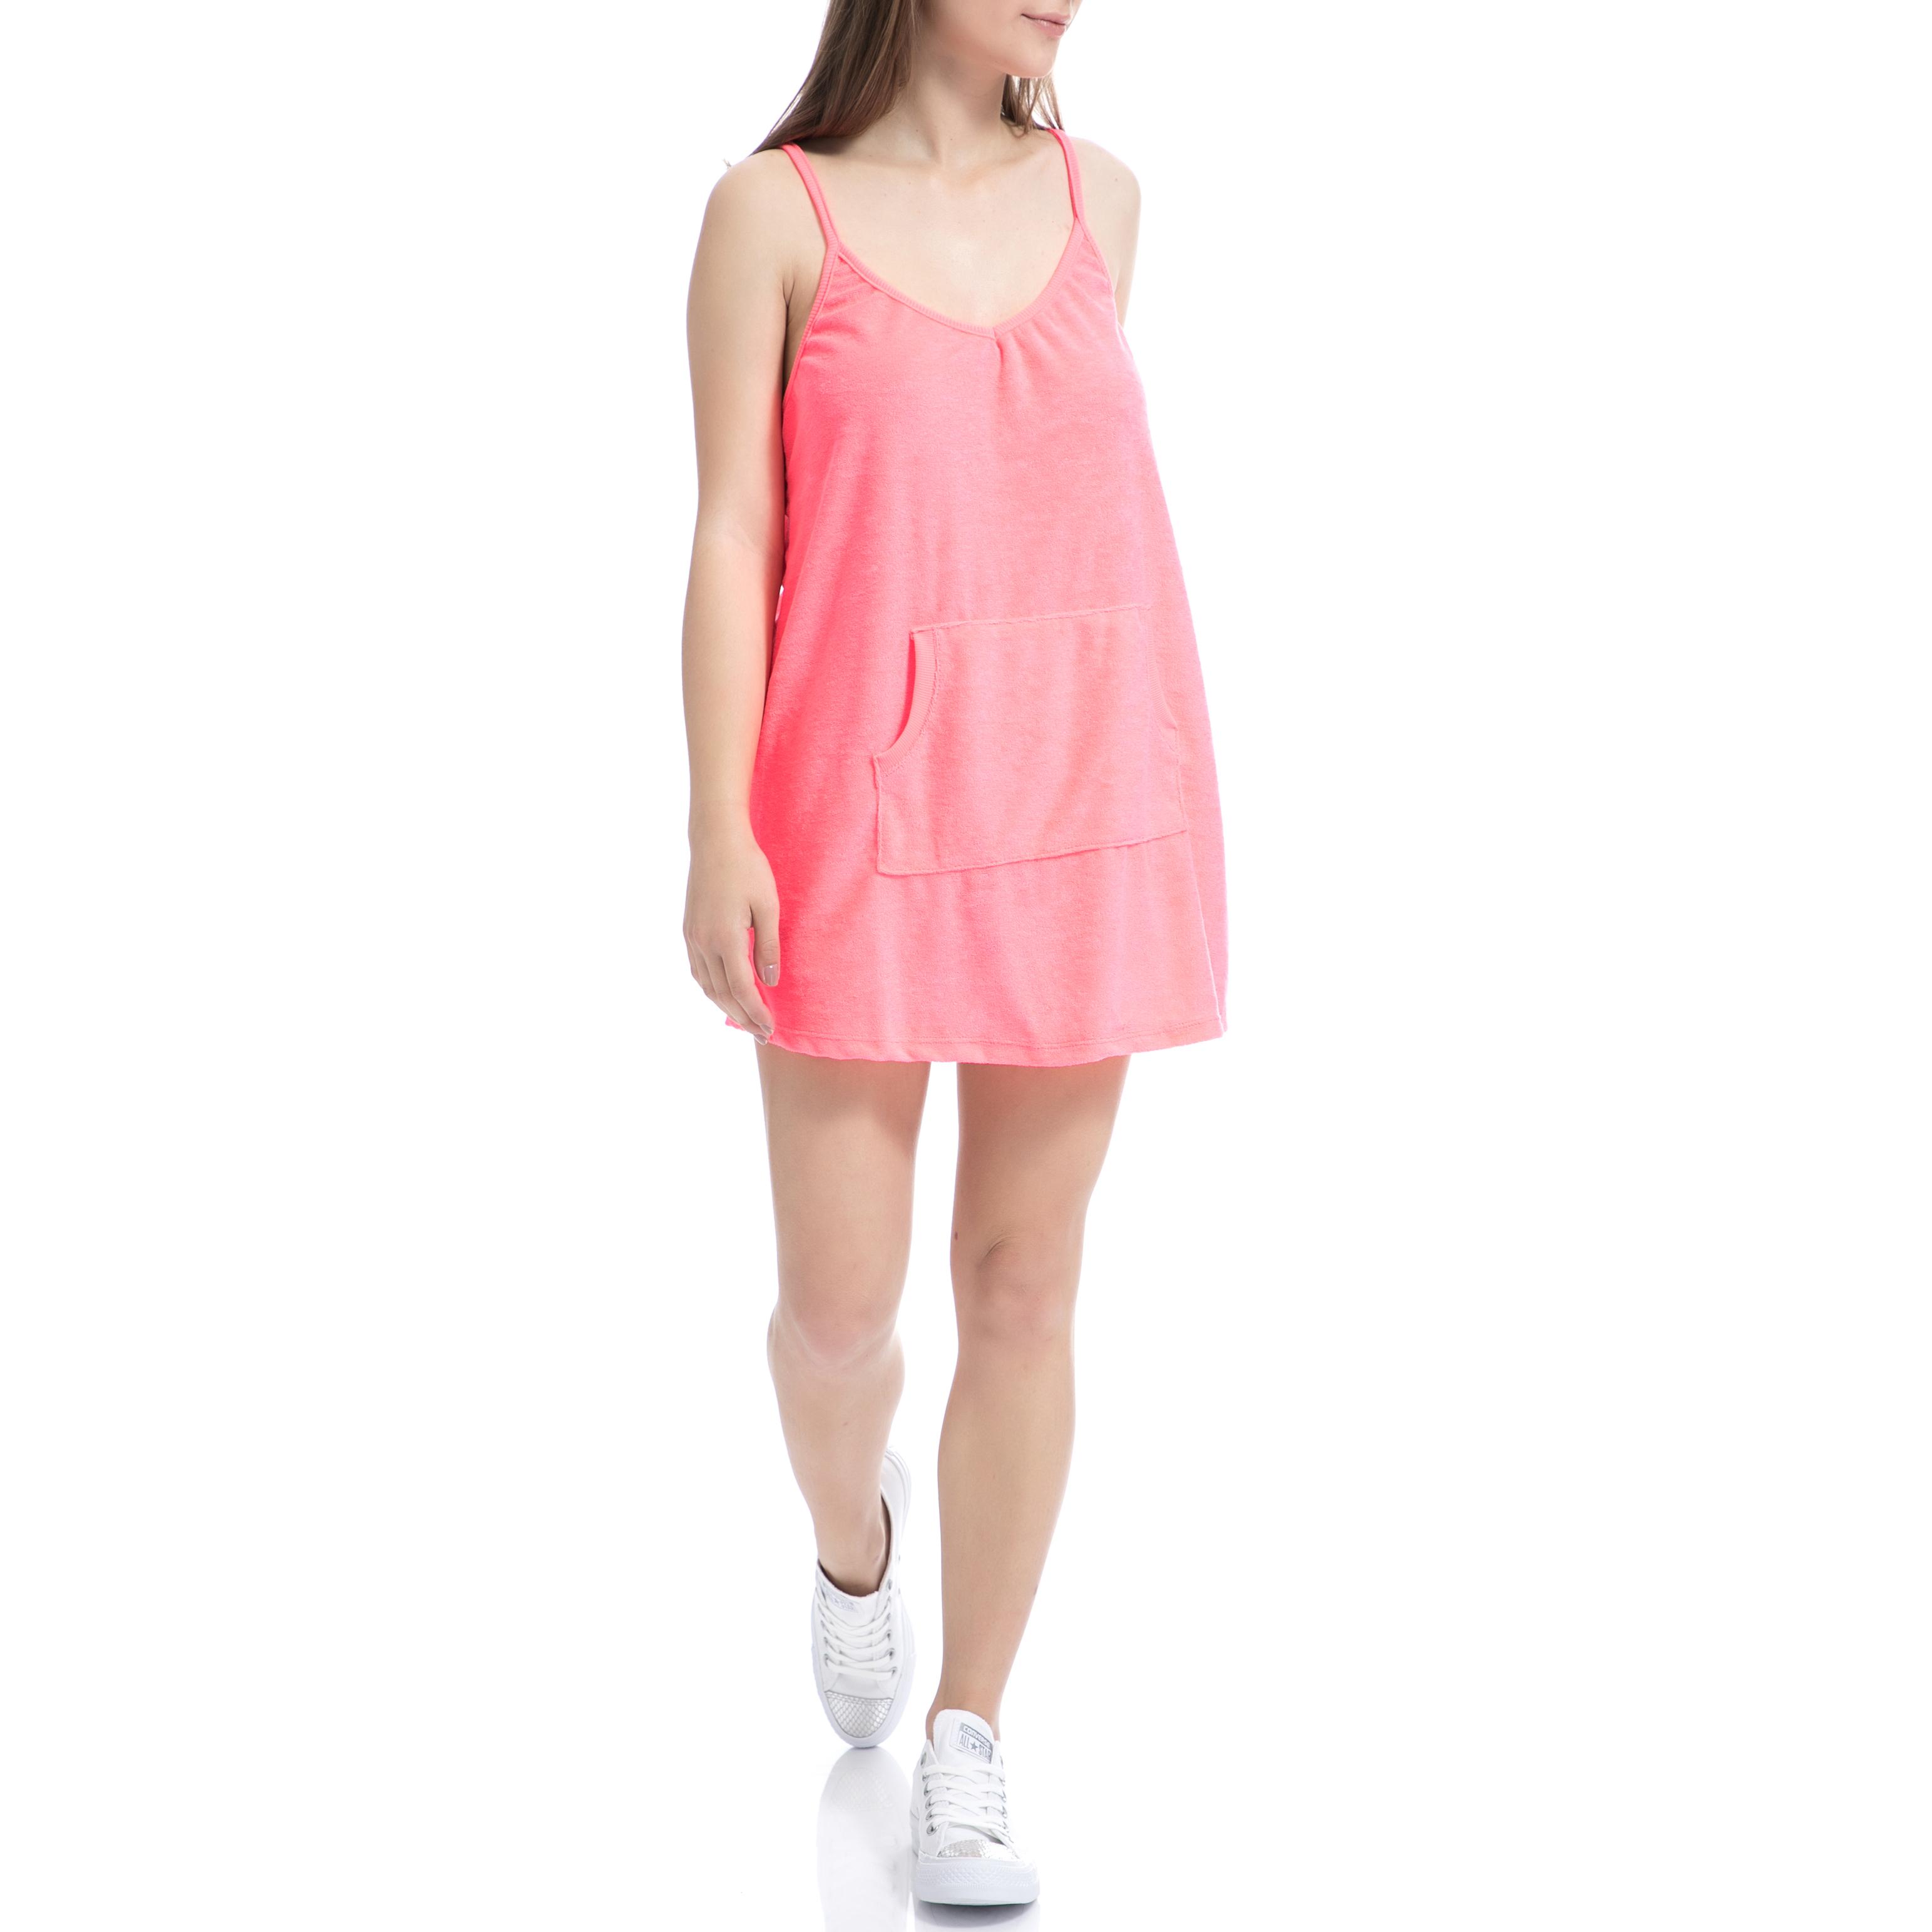 MYMOO - Γυναικείο φόρεμα MYMOO ροζ γυναικεία ρούχα φορέματα μίνι